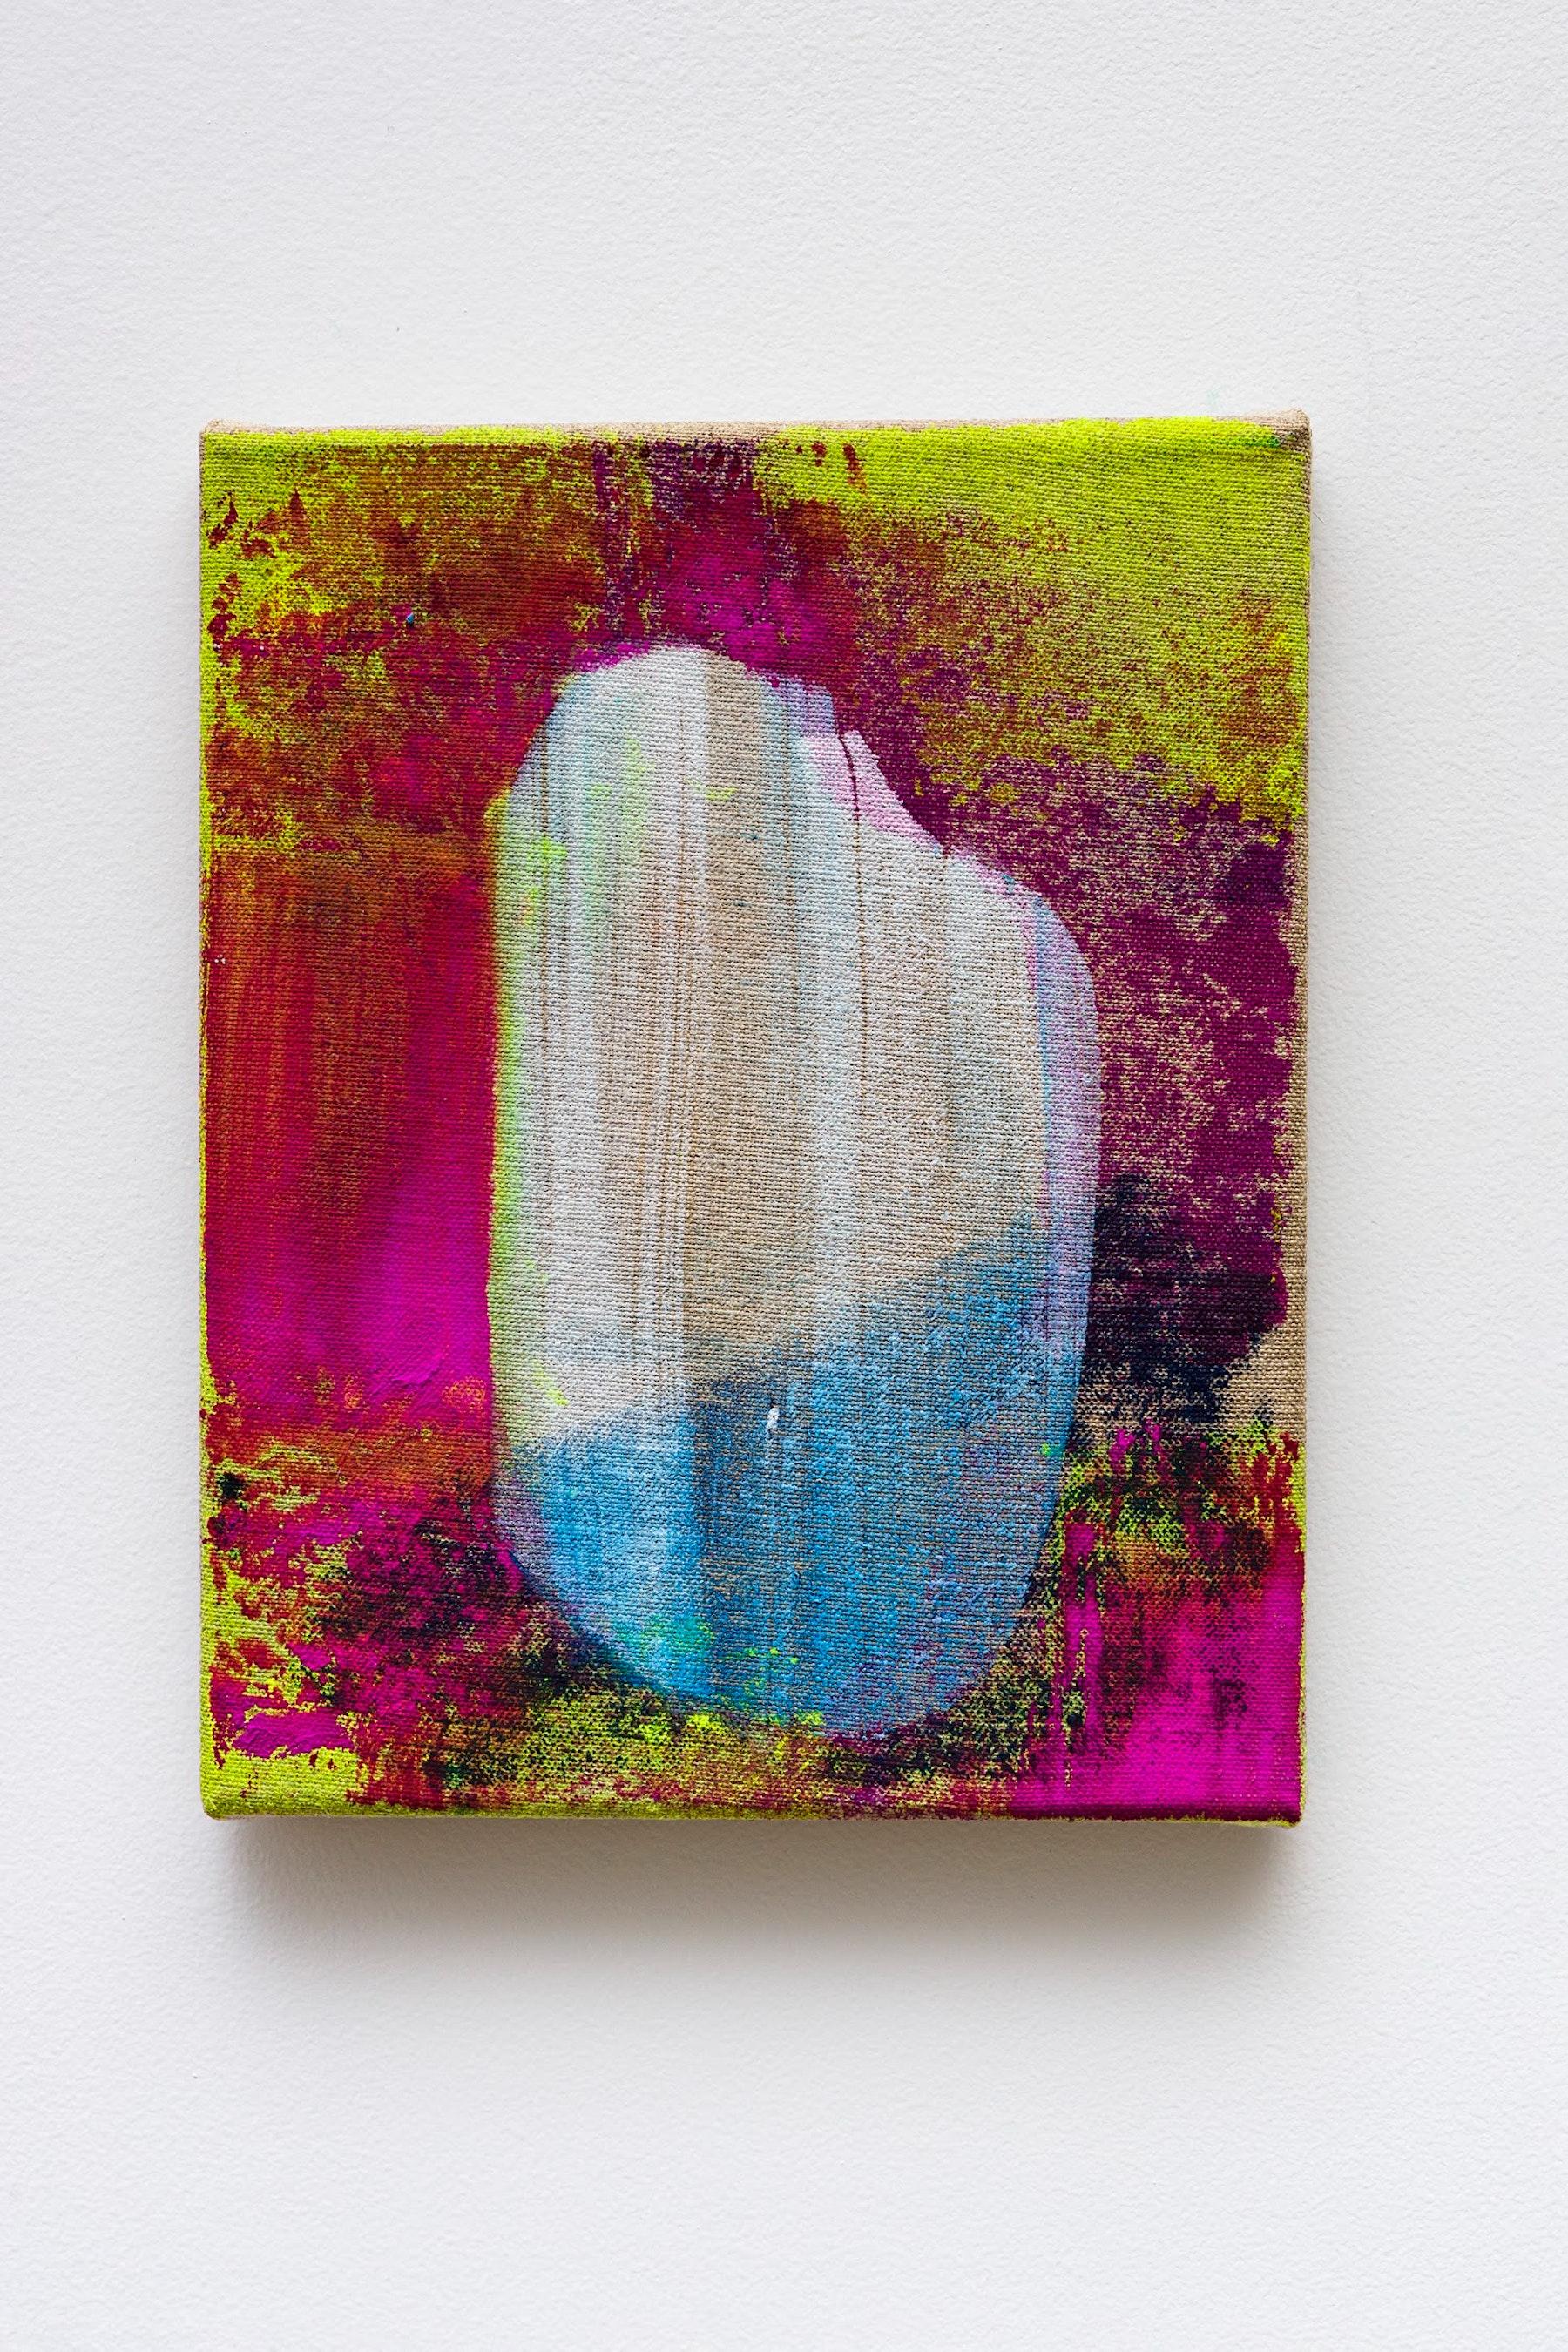 "Monique Van Genderen ""Untitled,"" 2020 Oil on linen 10 x 8"" [HxW] (25.4 x 20.32 cm) Inventory #VGE399 Courtesy of the artist and Vielmetter Los Angeles Photo credit: Jeff Mclane"